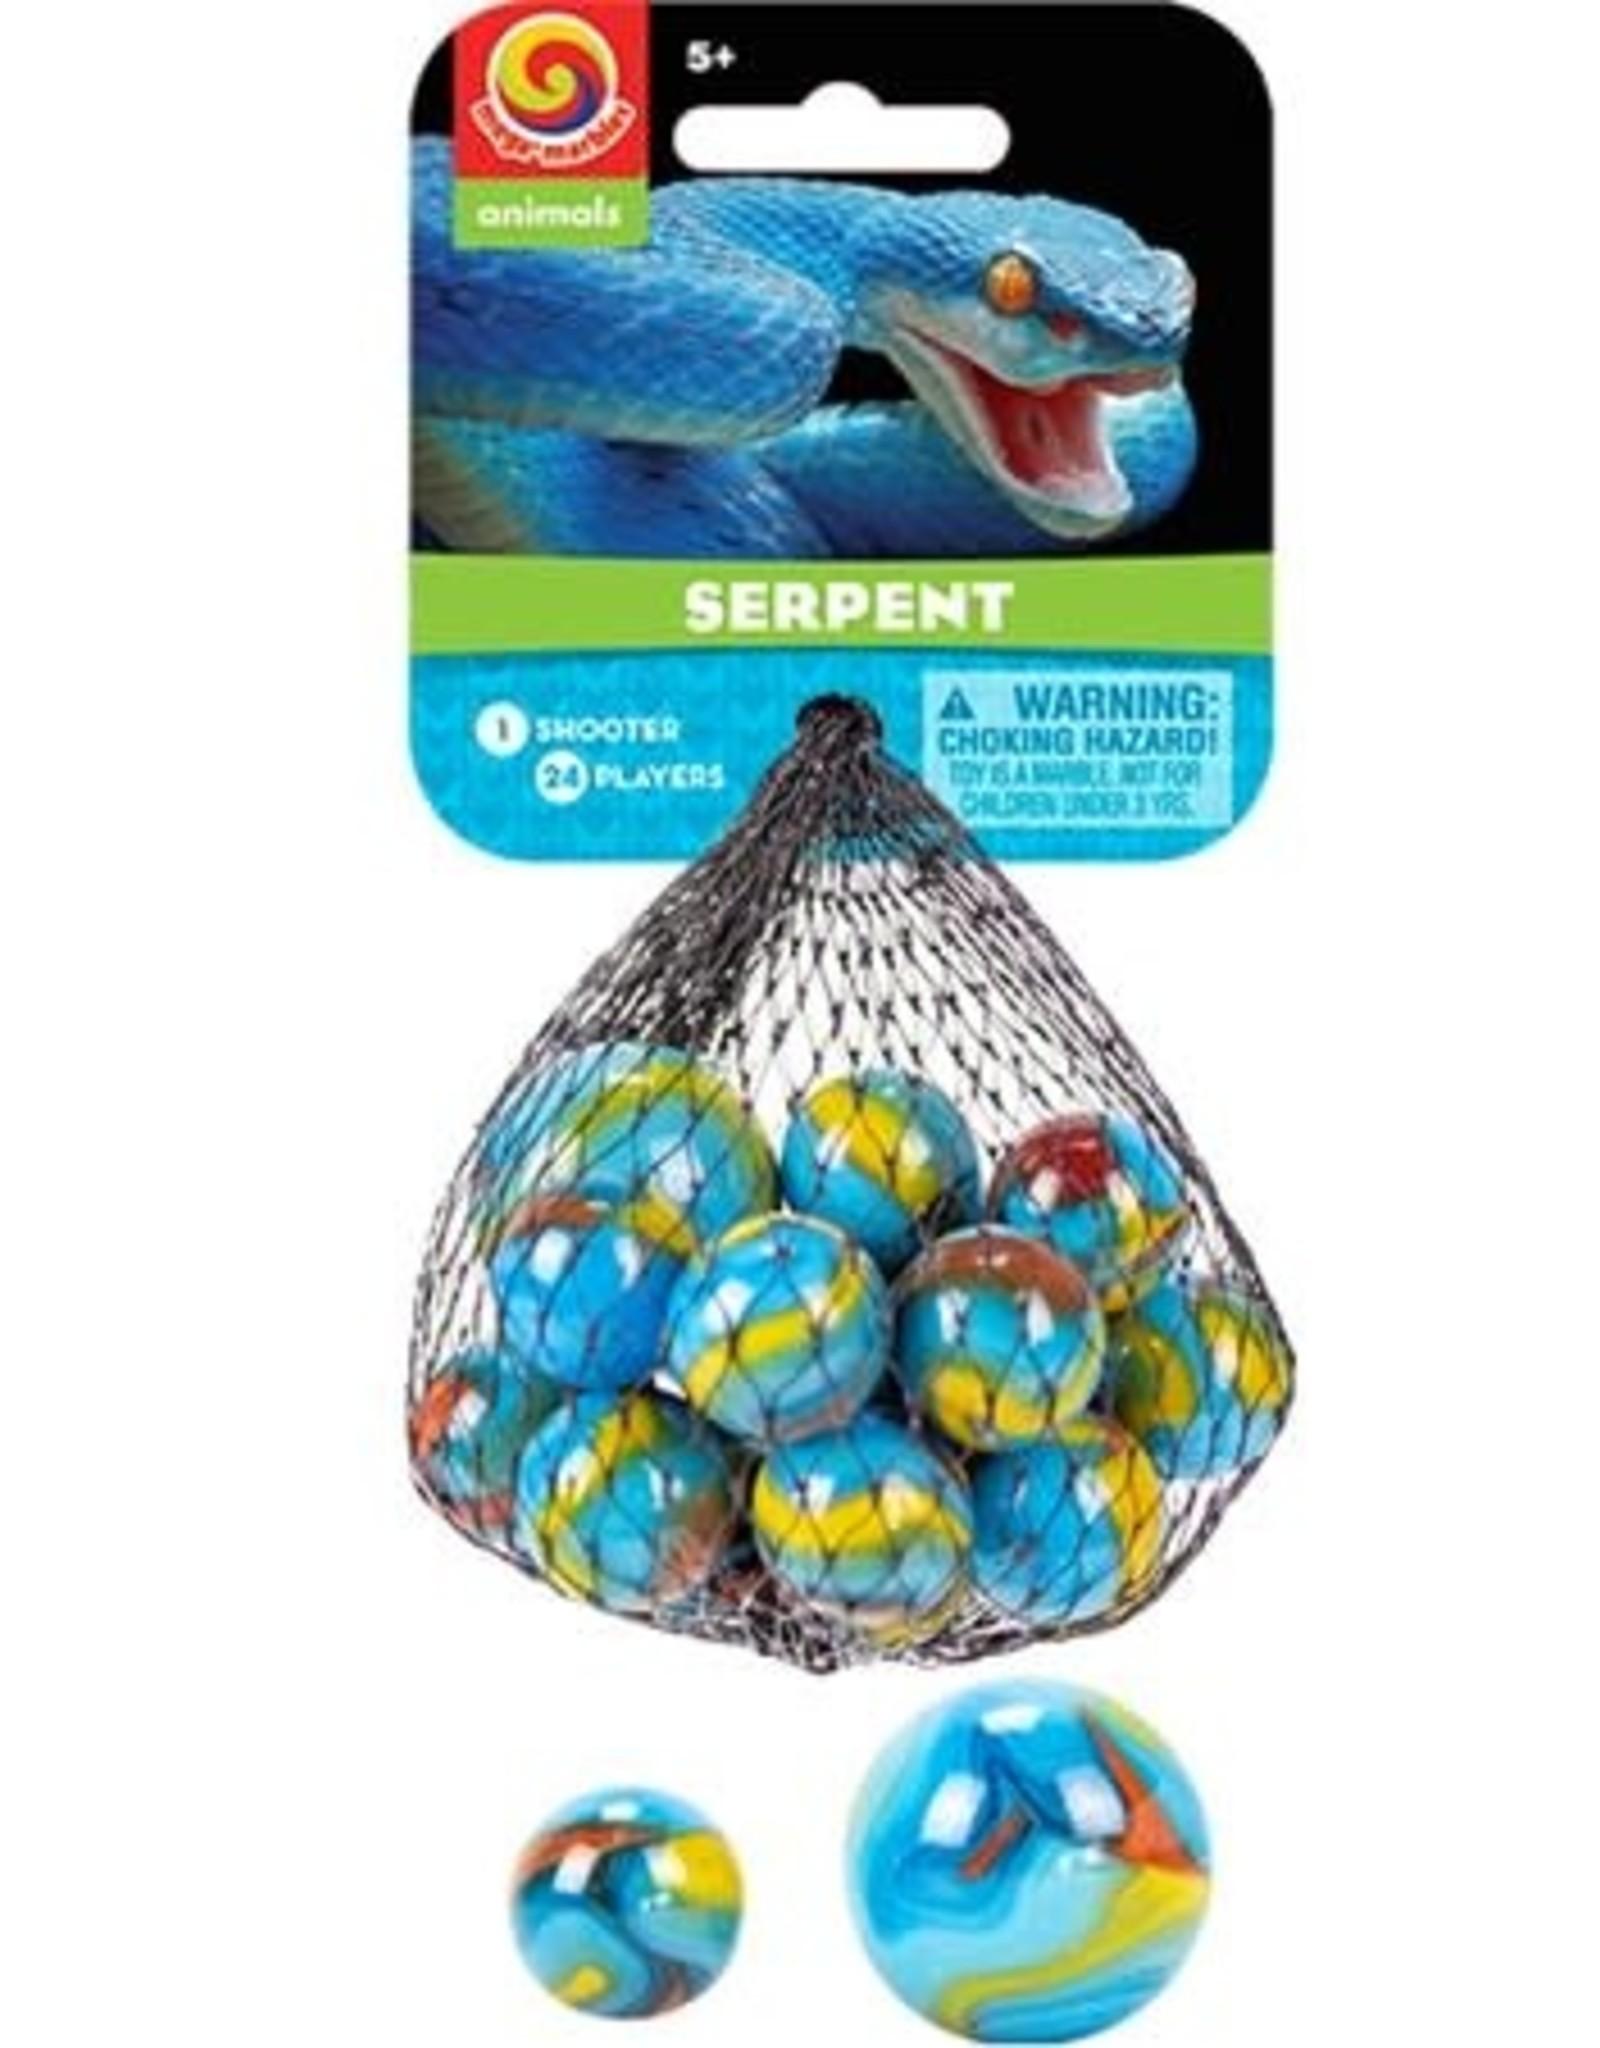 Mega Marbles Serpent Marble Game Net